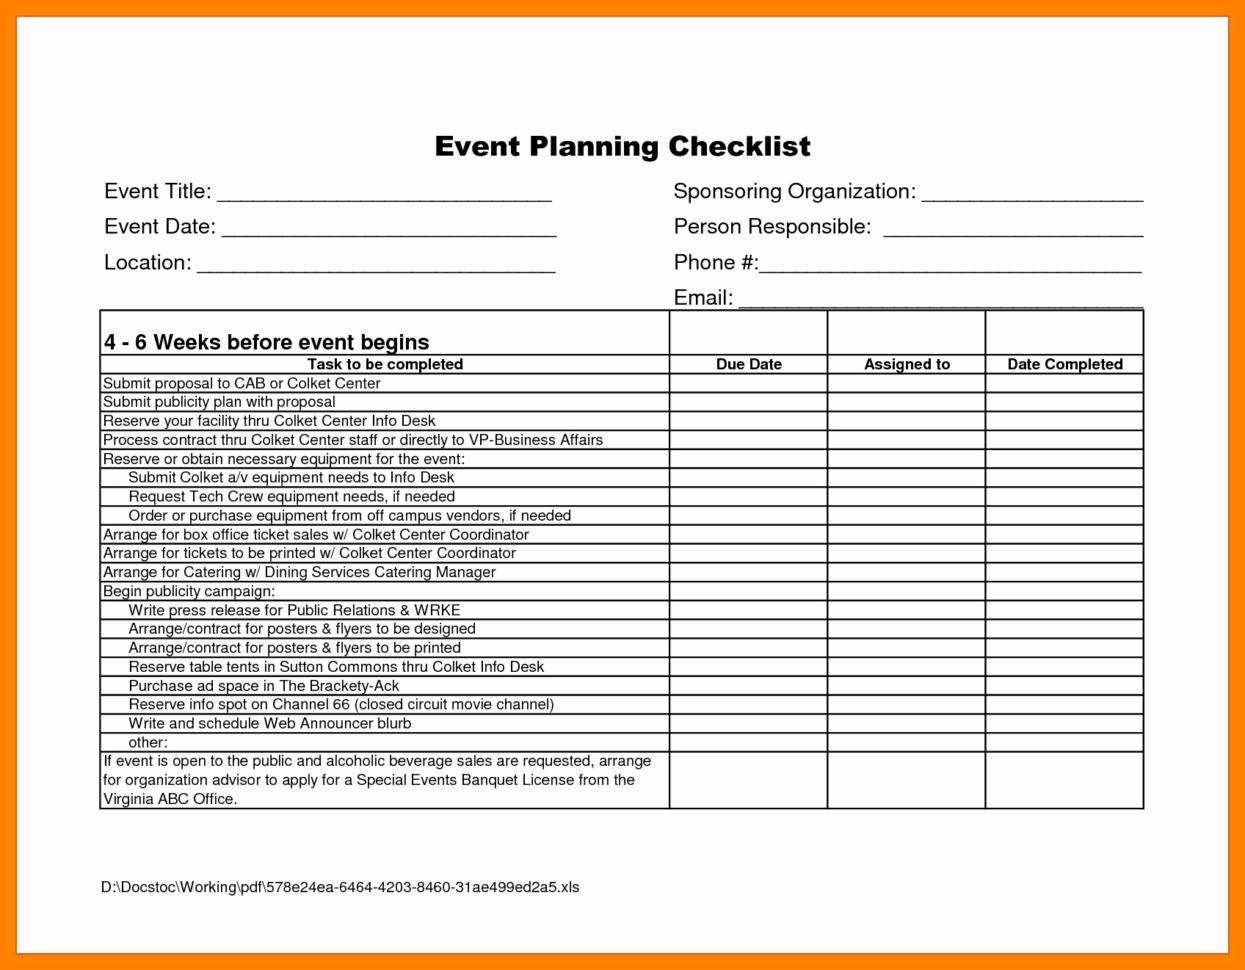 Vendor Spreadsheet Within 8  Event Planning Checklist Spreadsheet  Business Opportunity Program